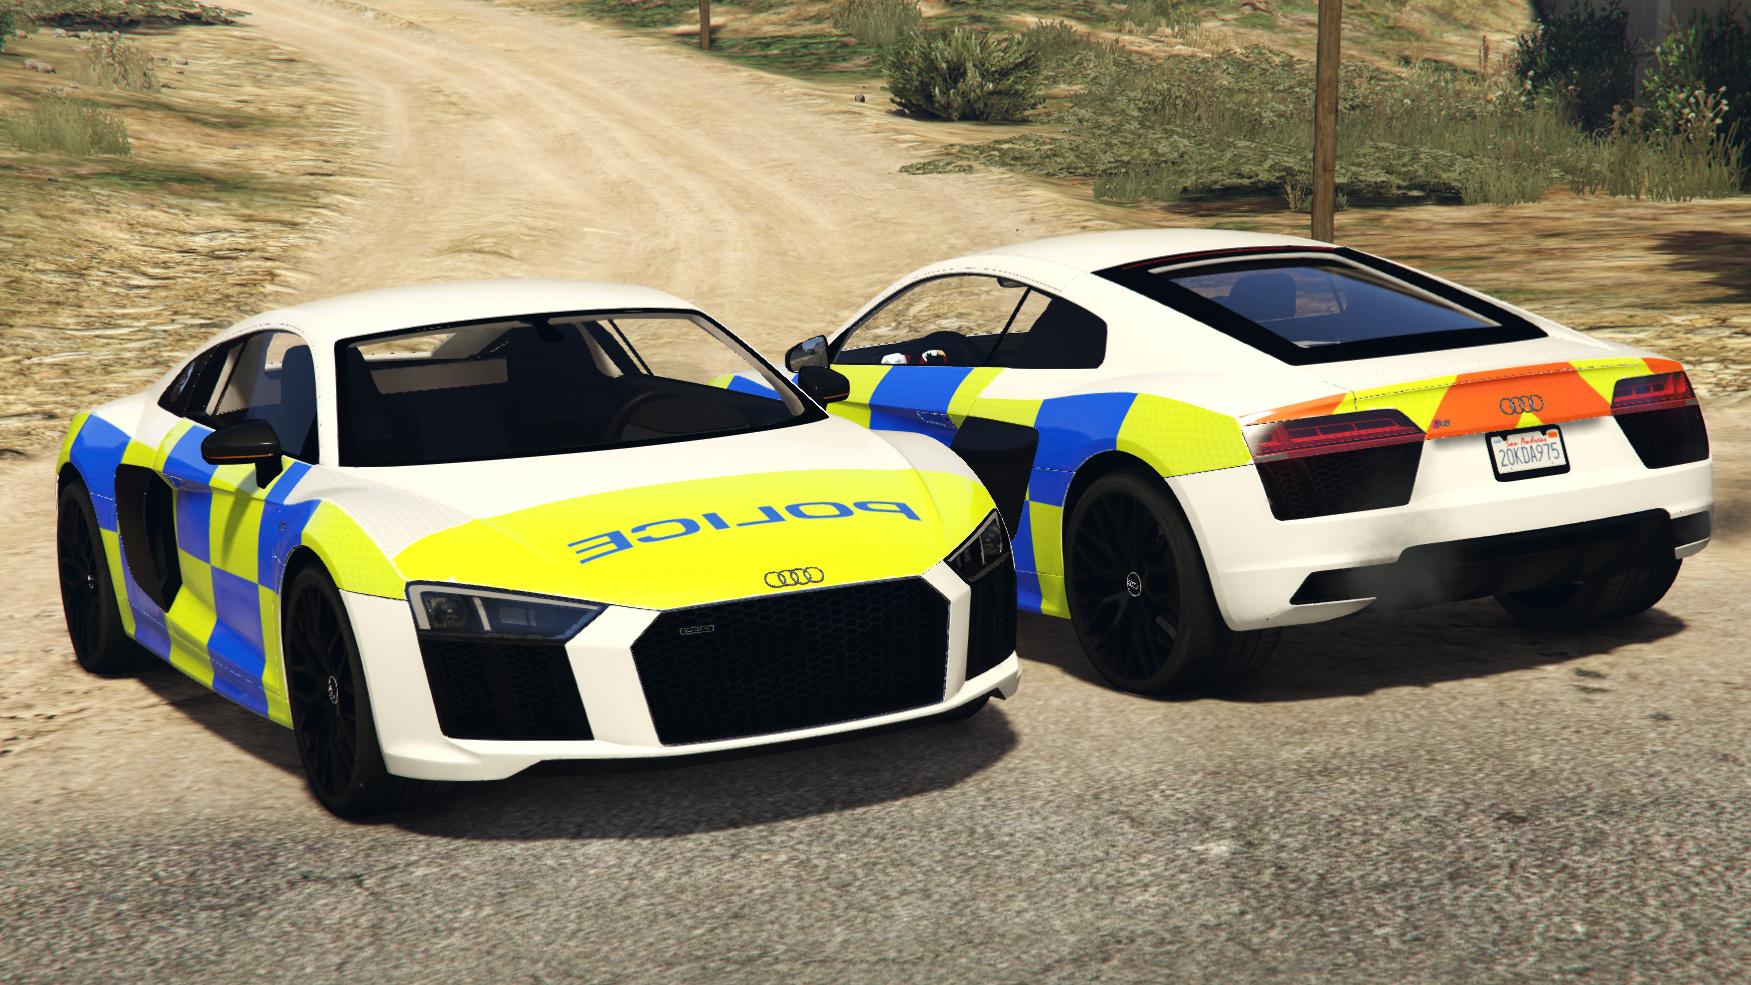 Generic British Police Skin For Abdulrhman1 S Audi R8 No Lights